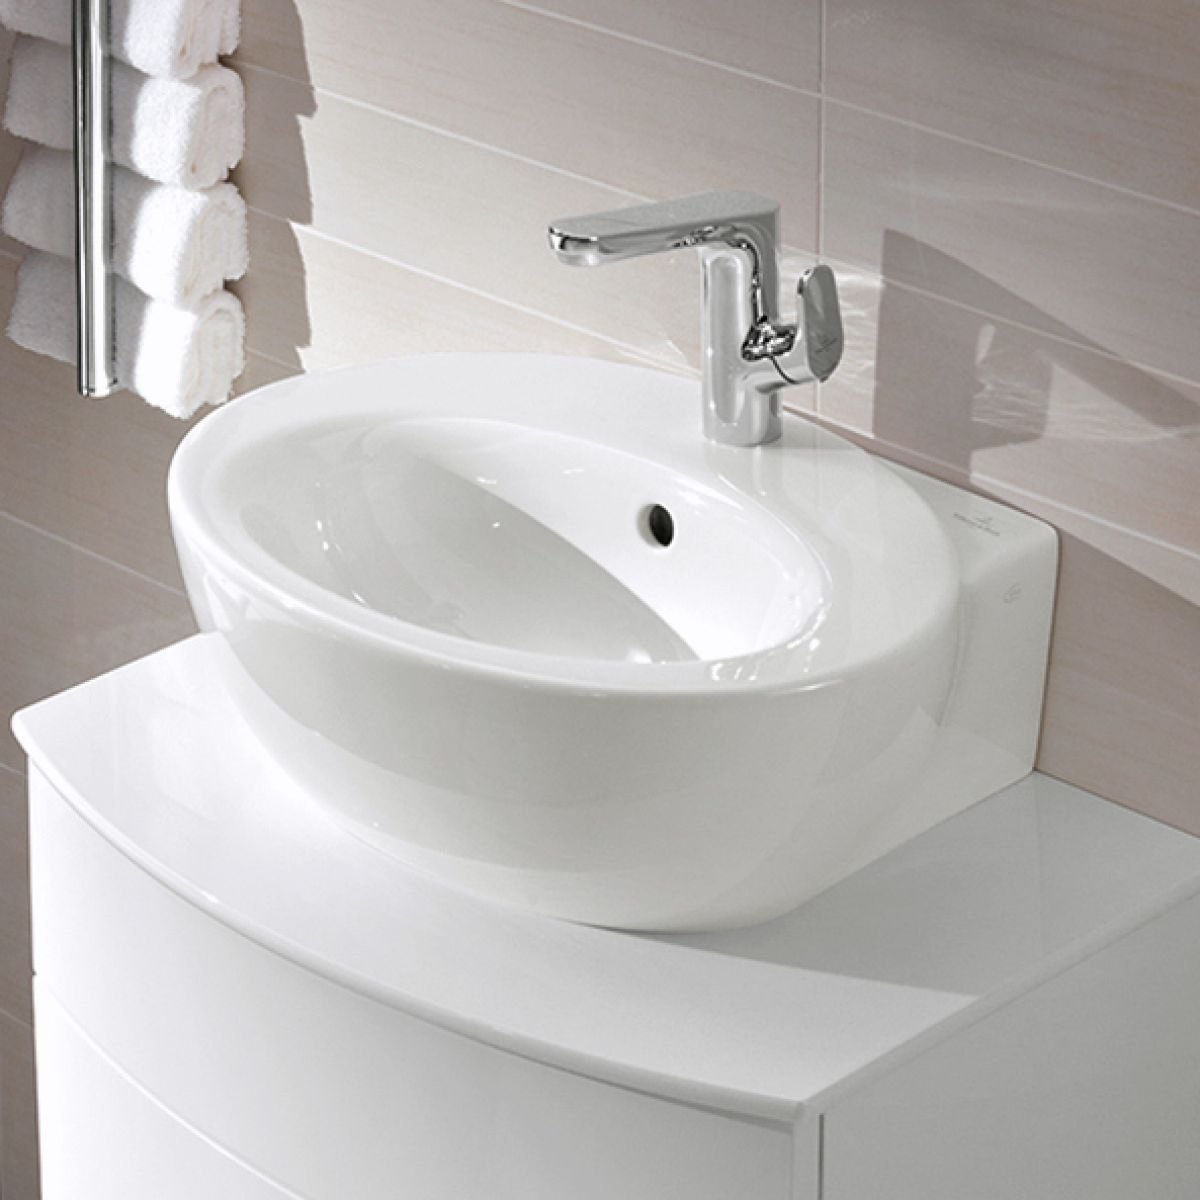 v b aveo new generation oval washbasin uk bathrooms. Black Bedroom Furniture Sets. Home Design Ideas